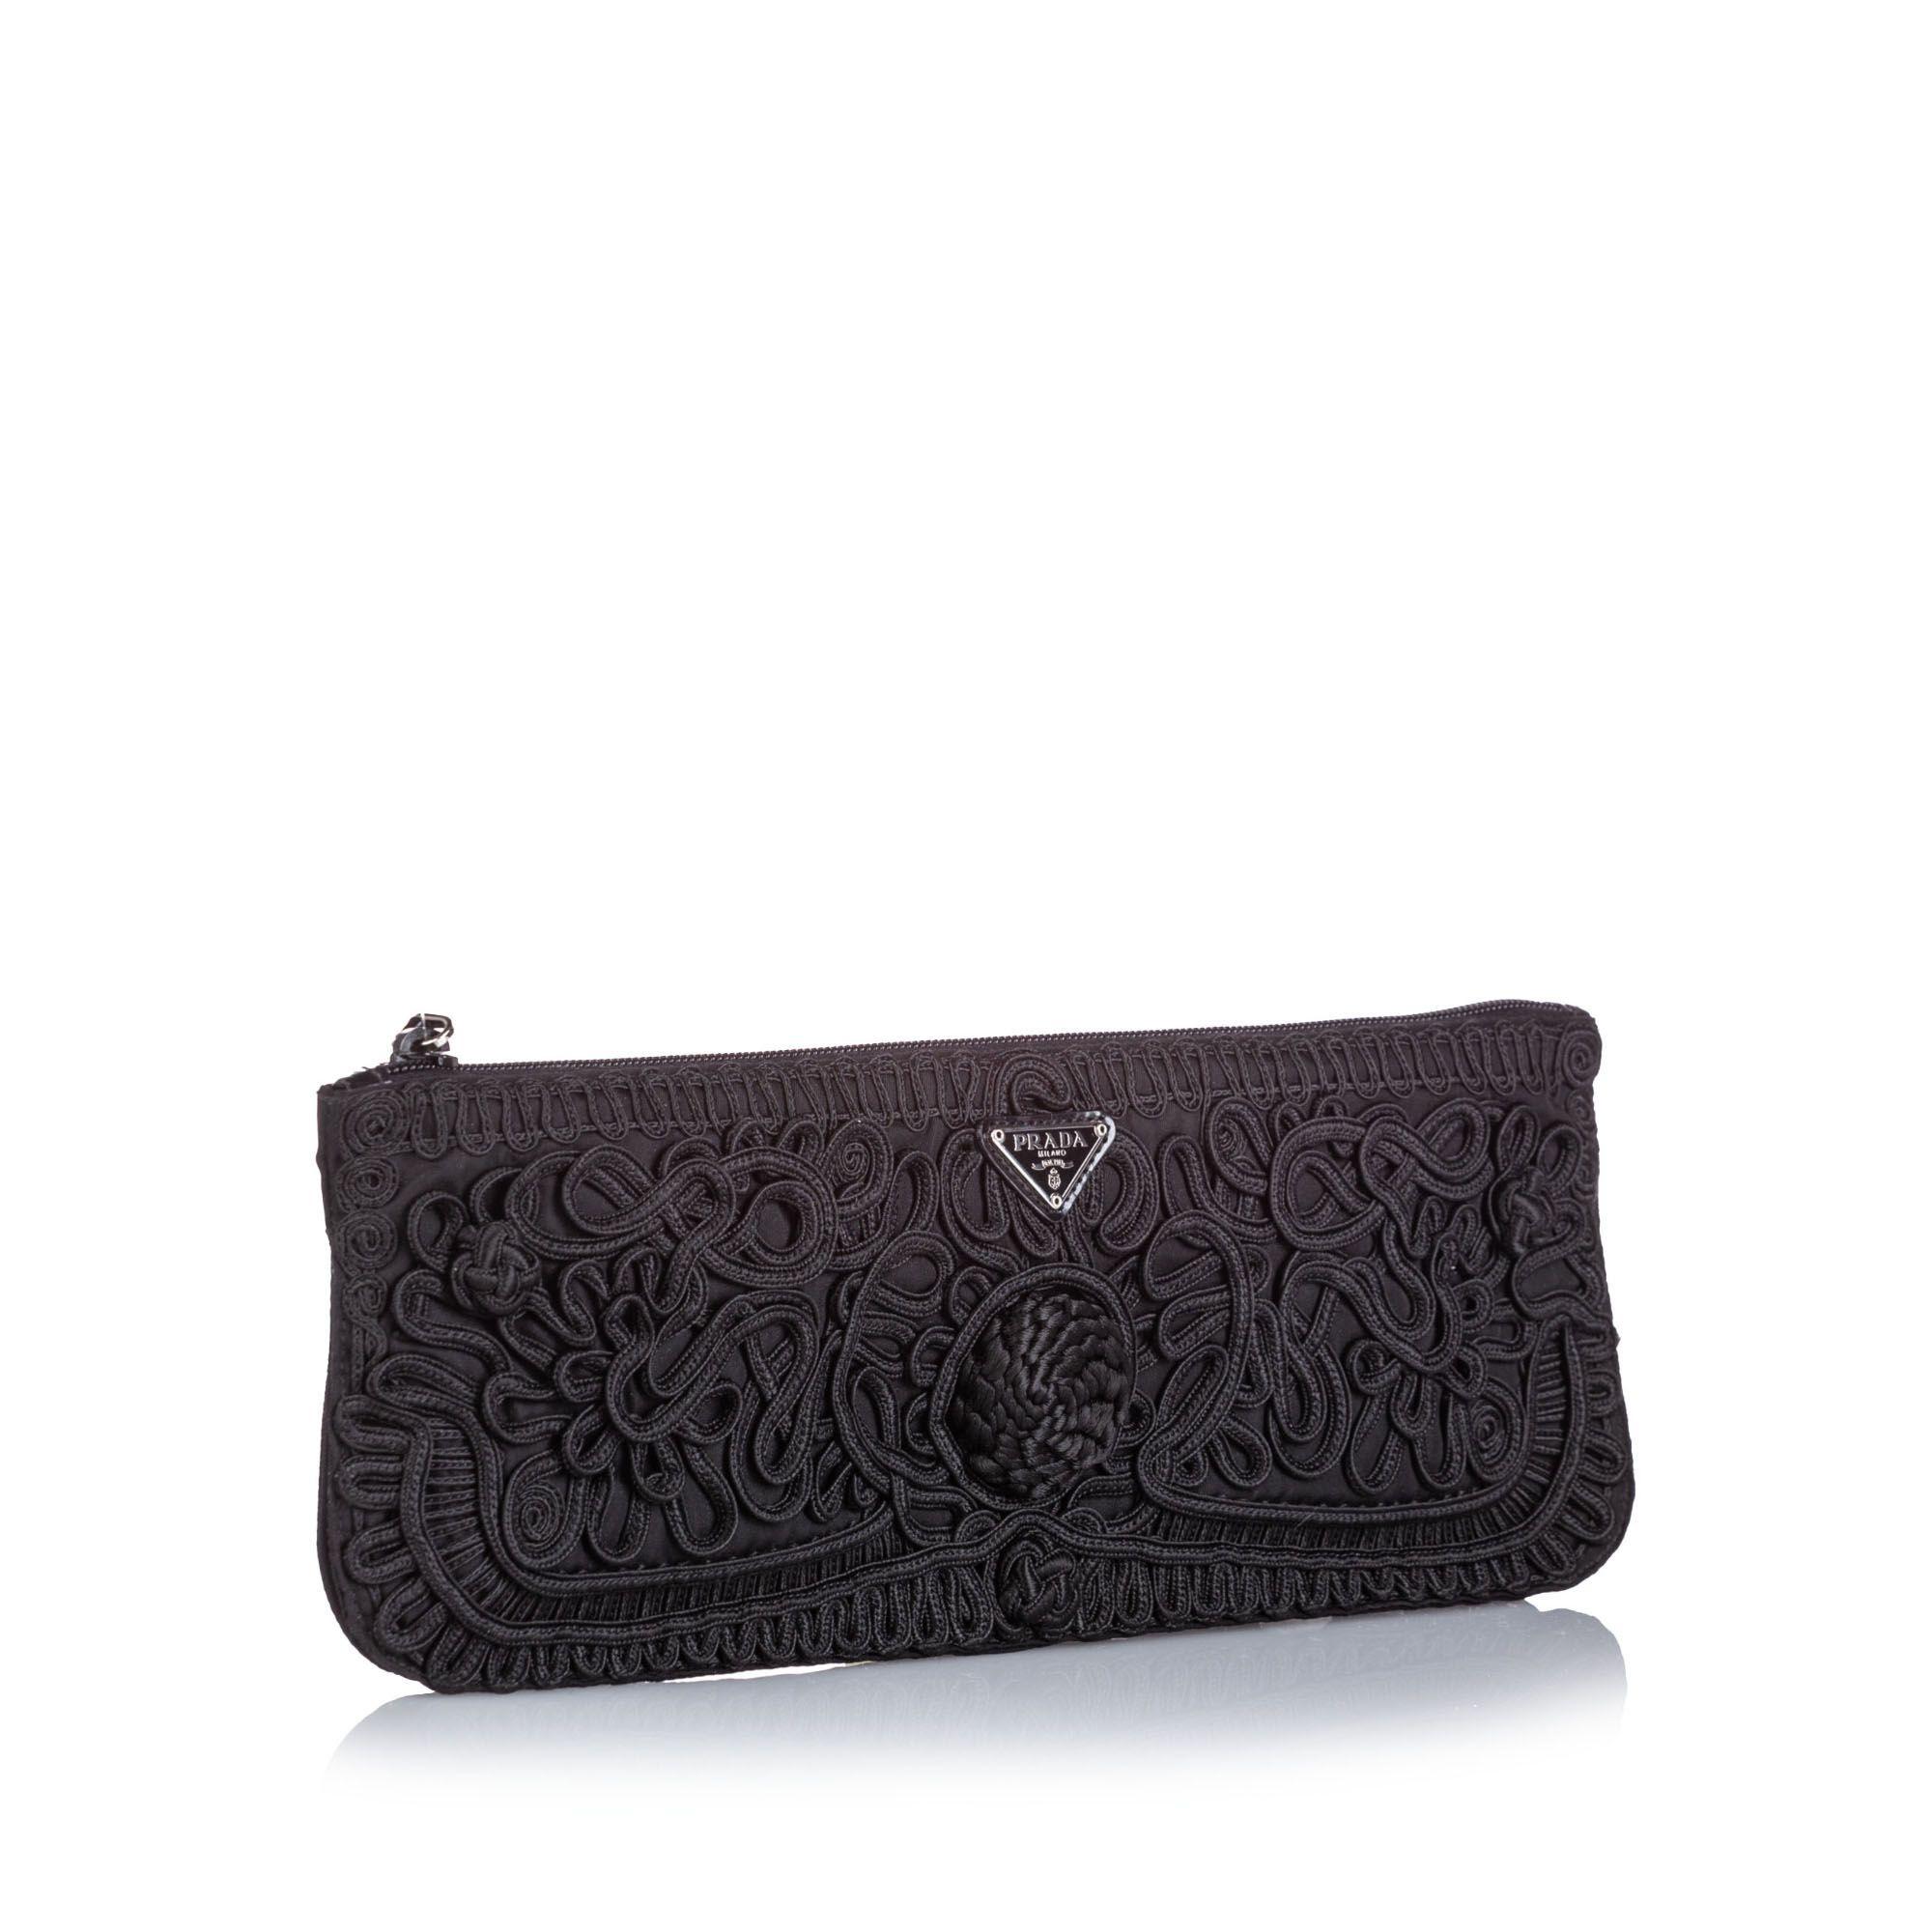 Vintage Prada Tessuto Passamaneria Clutch Black